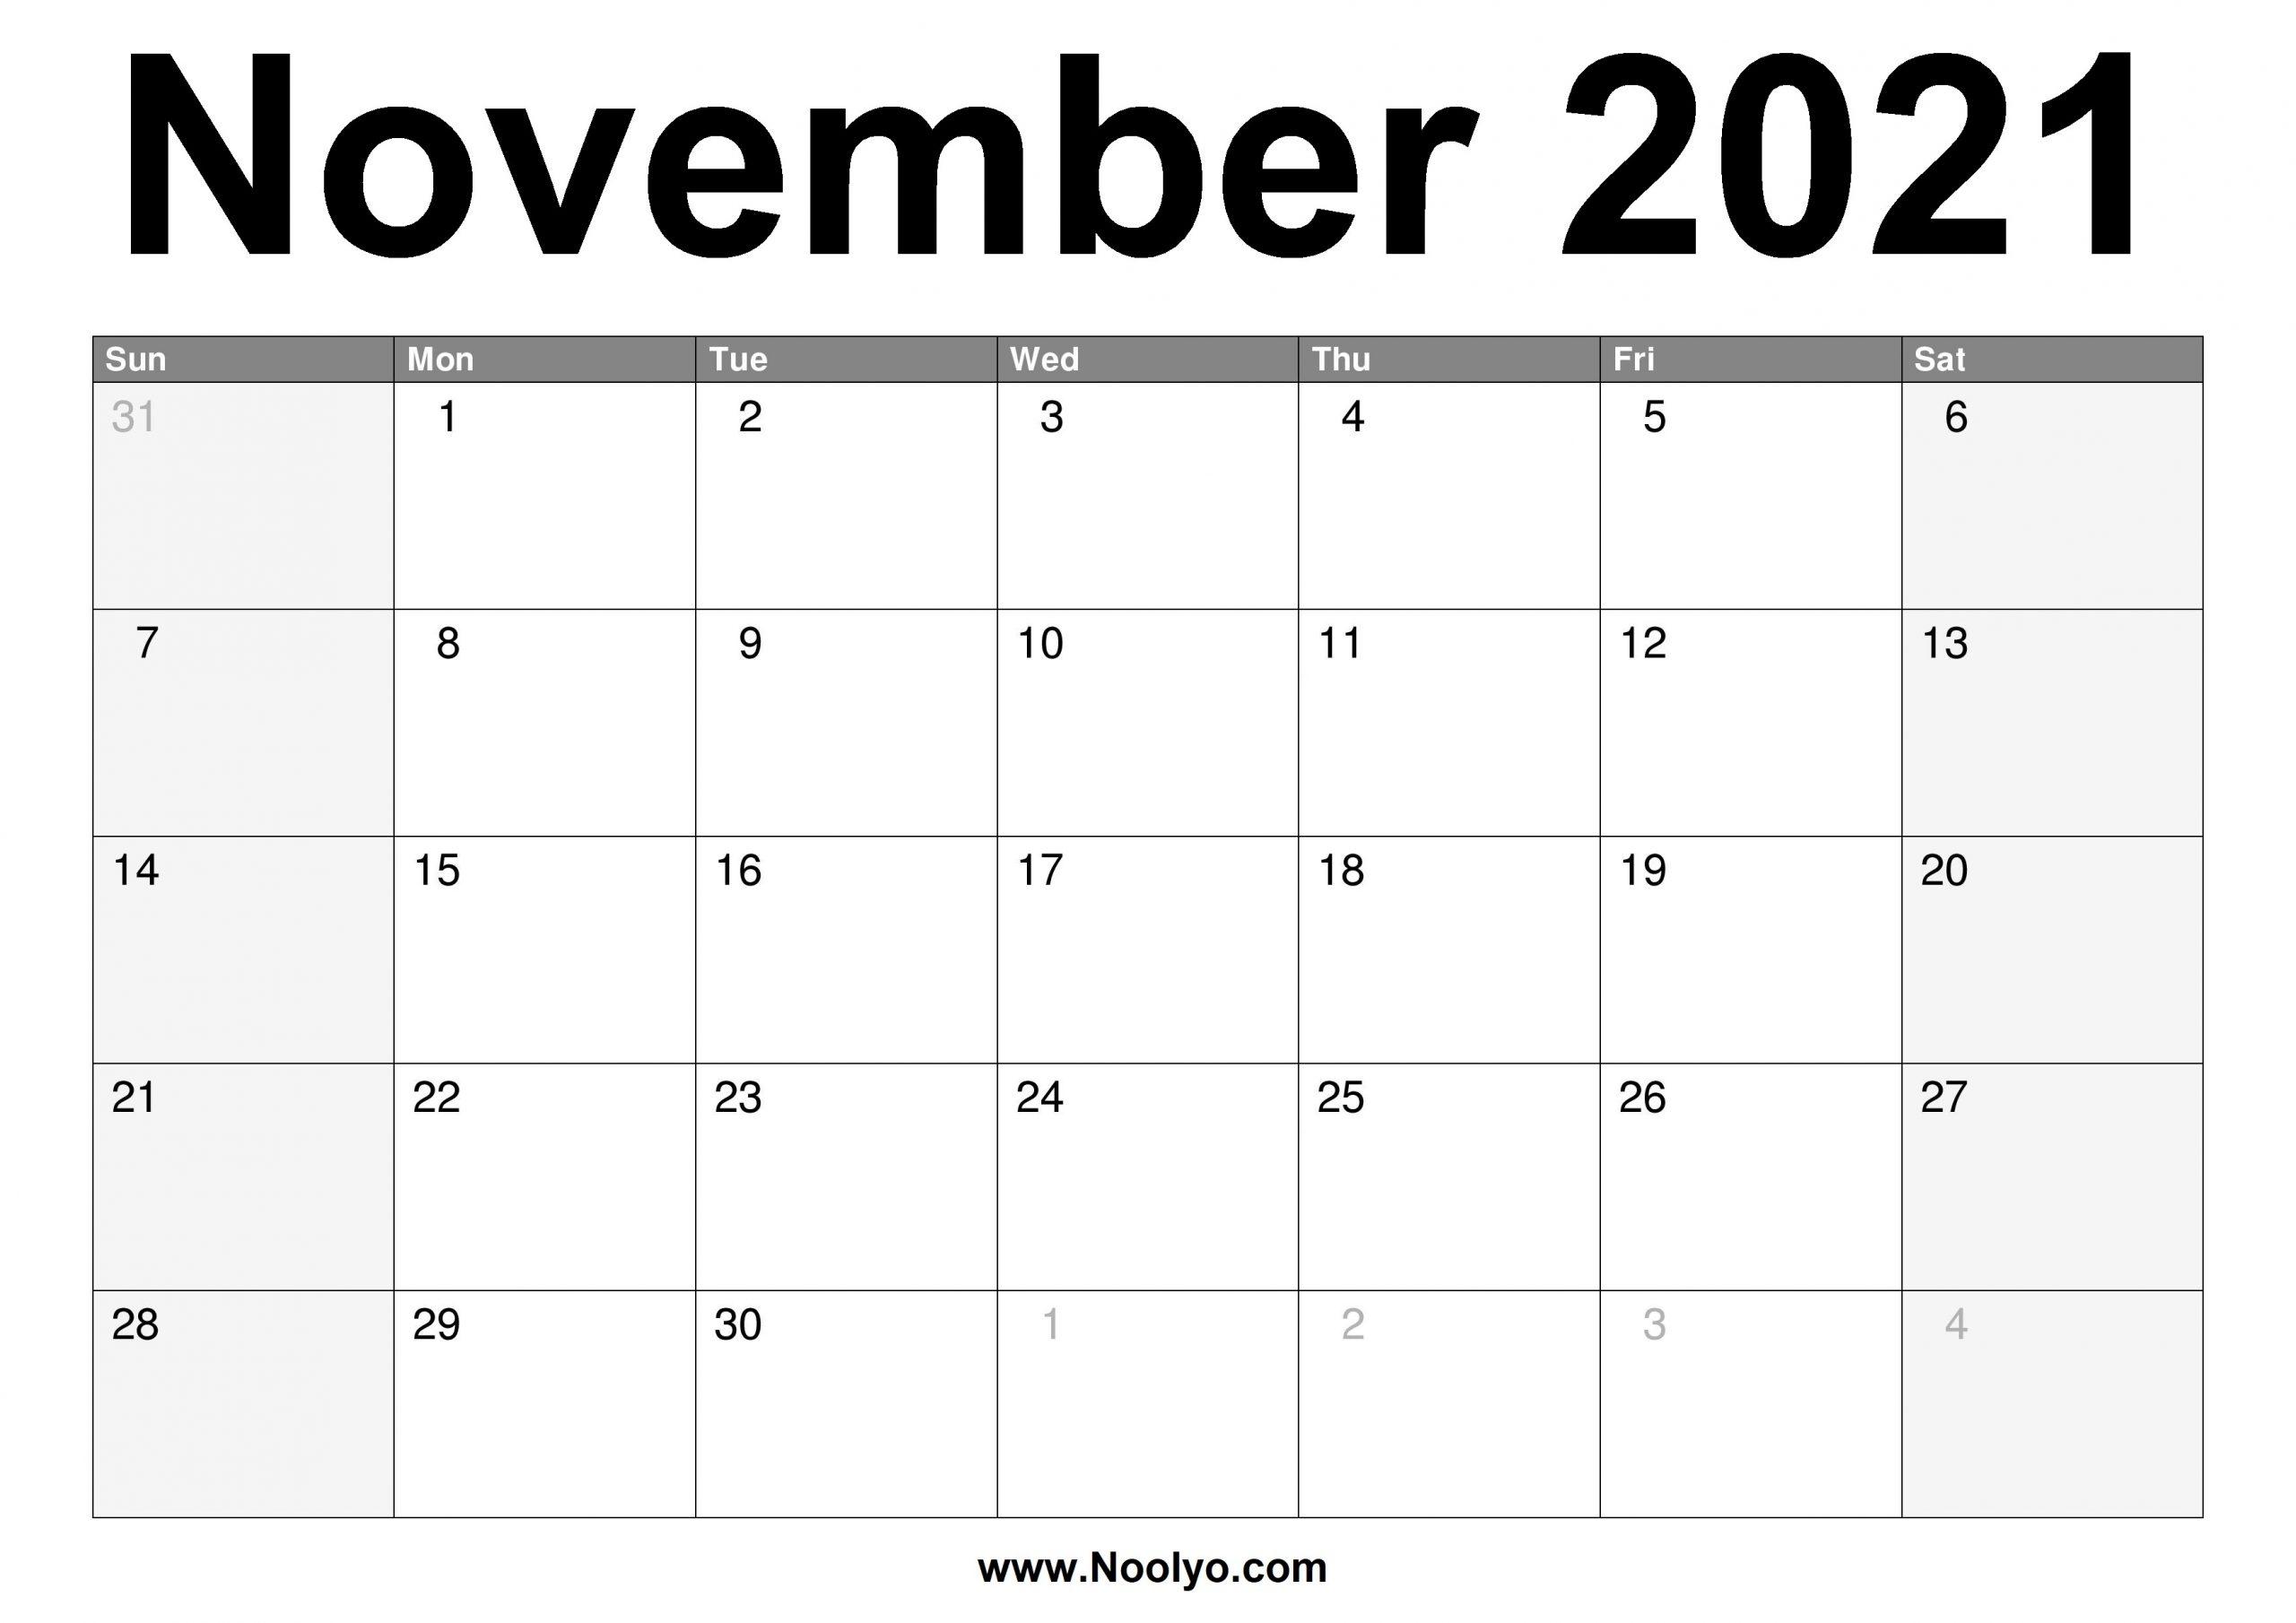 November 2021 Calendar Printable – Free Download – Noolyo